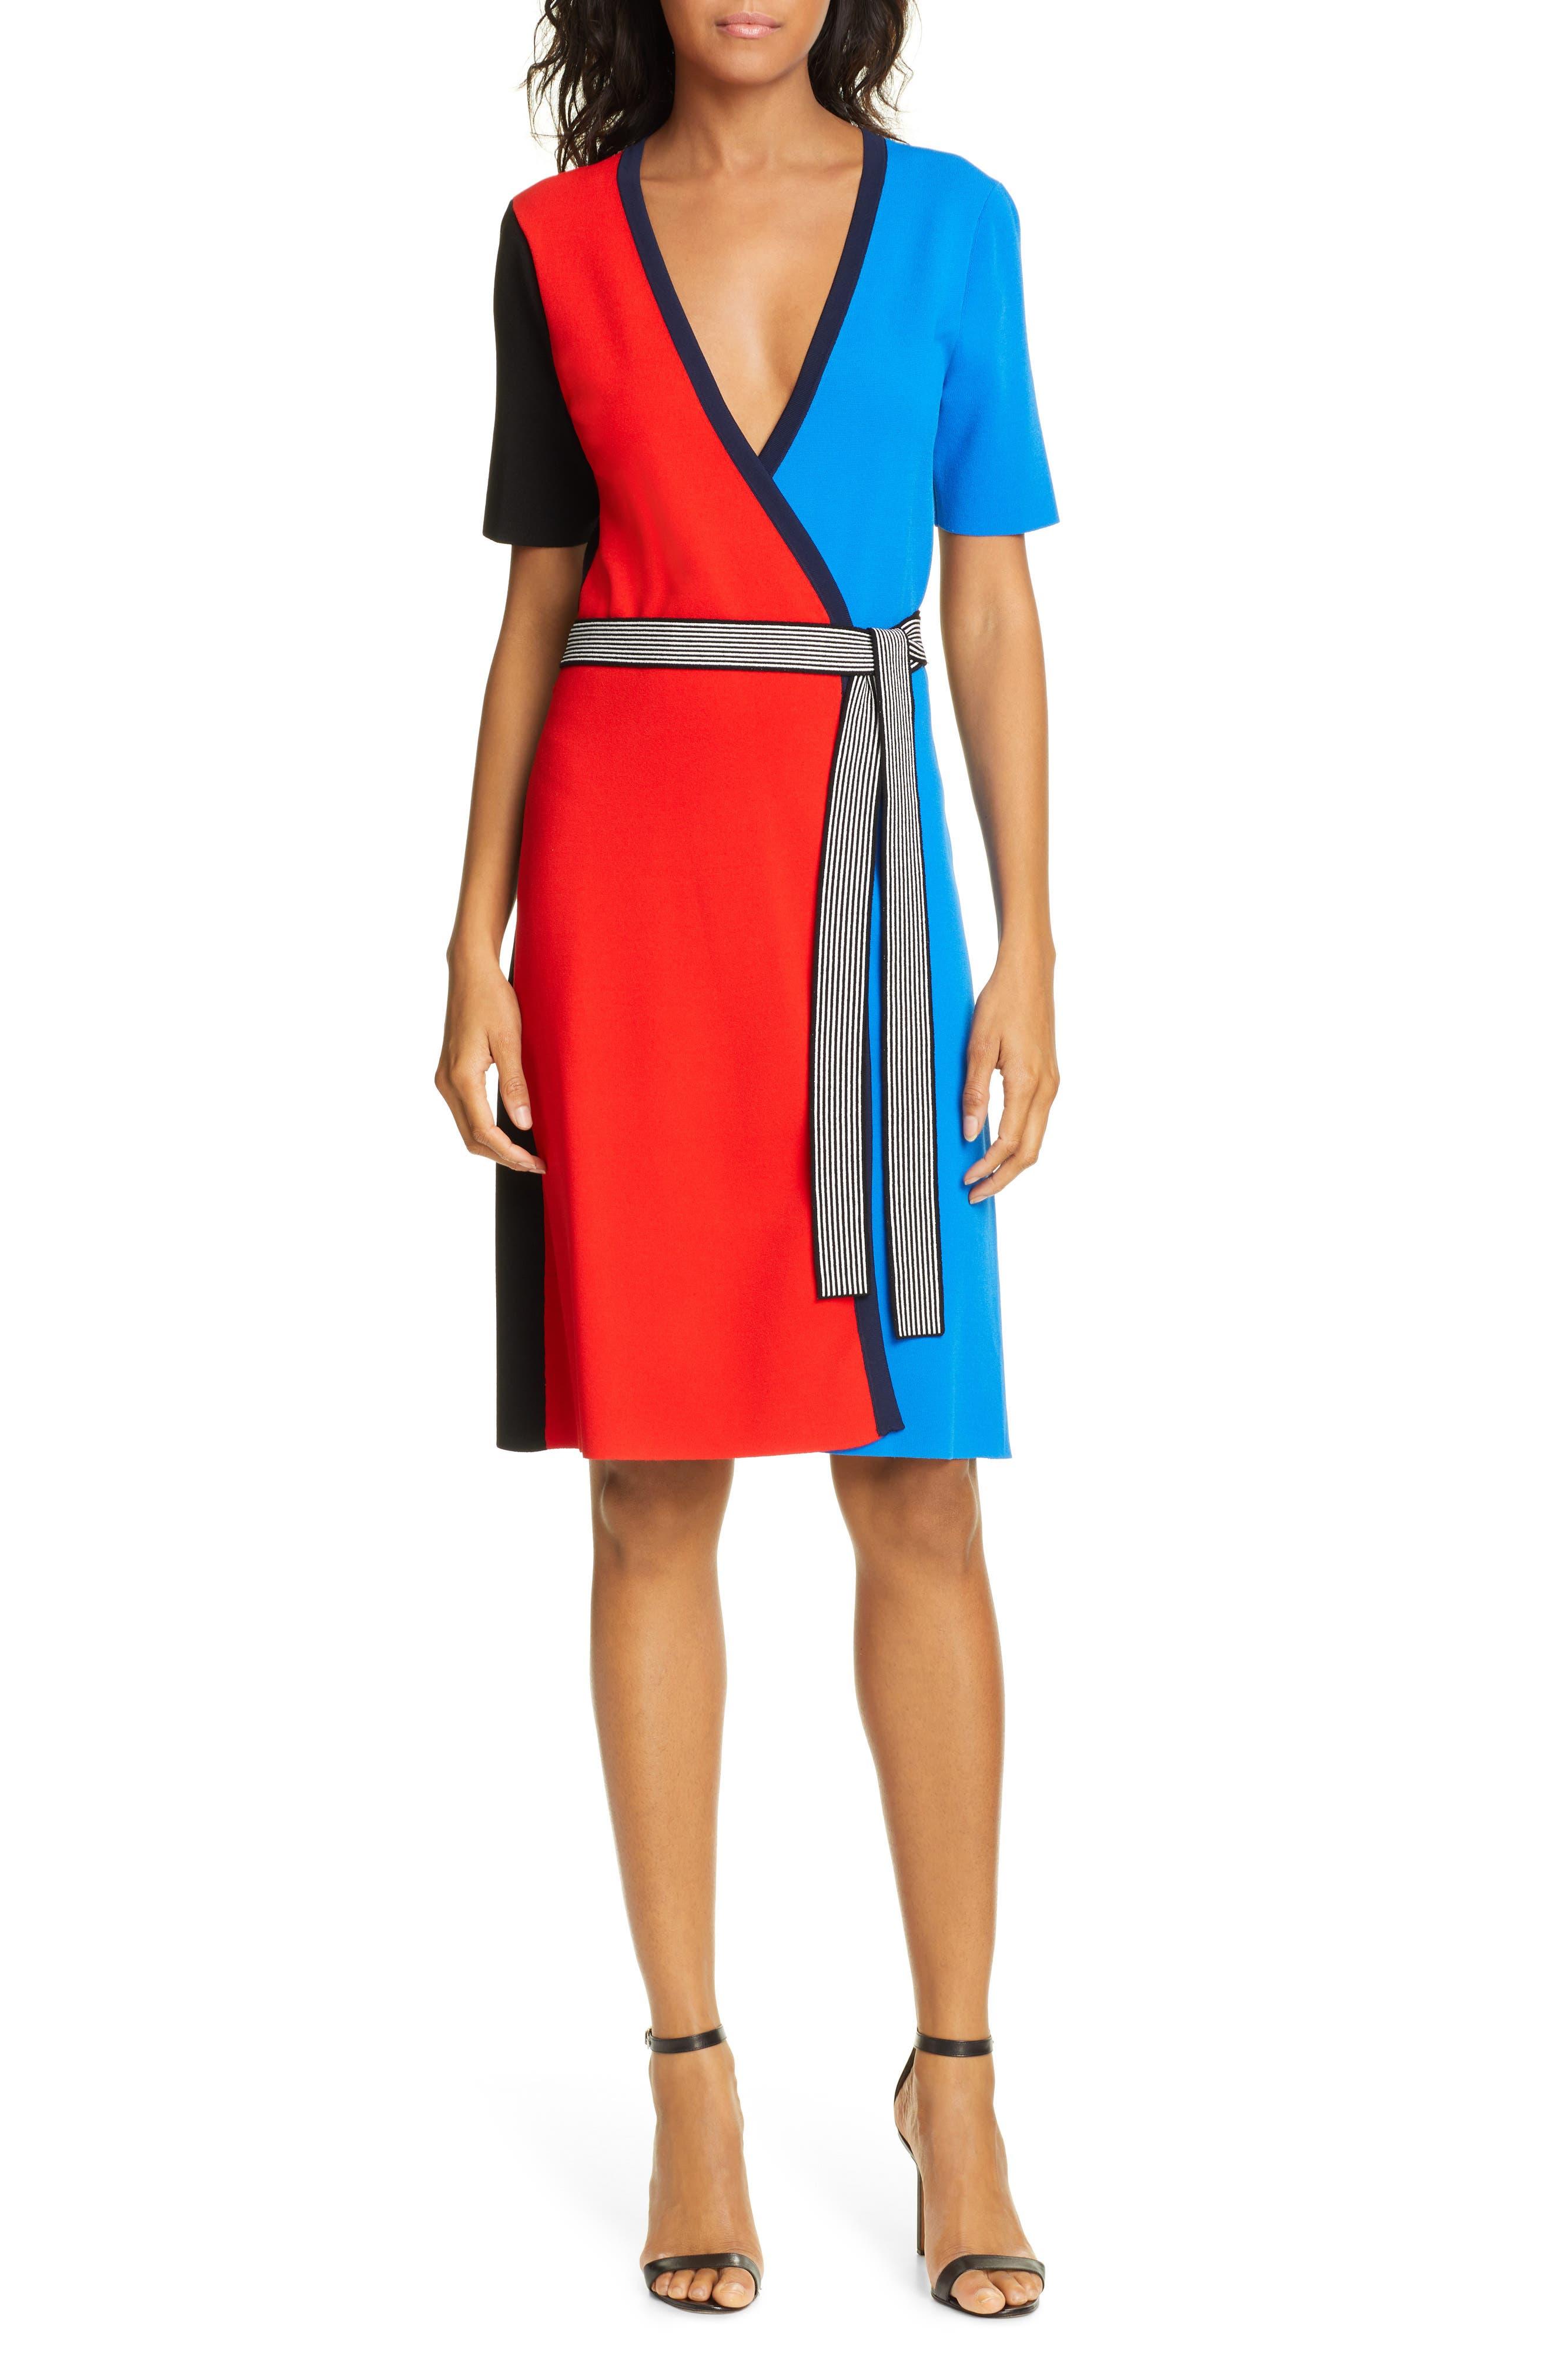 Dvf Halston Colorblock Wrap Dress, Red